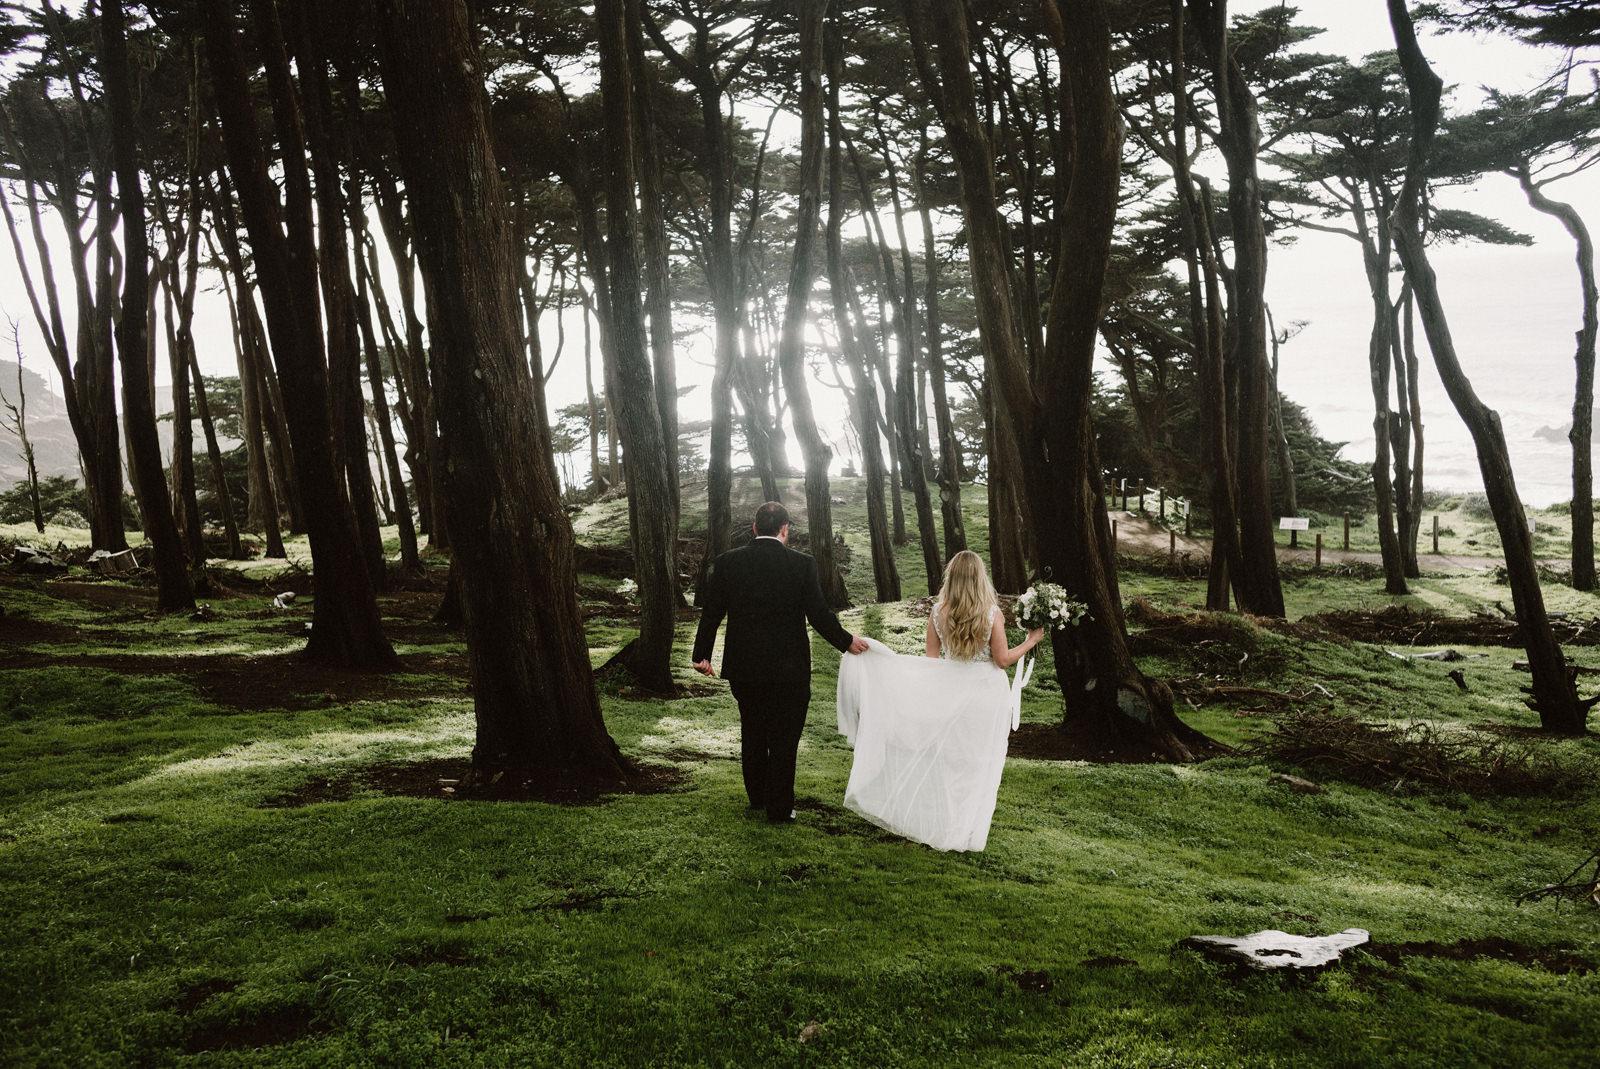 san-francisco-city-hall-elopement-38 SAN FRANCISCO CITY HALL INTIMATE WEDDING